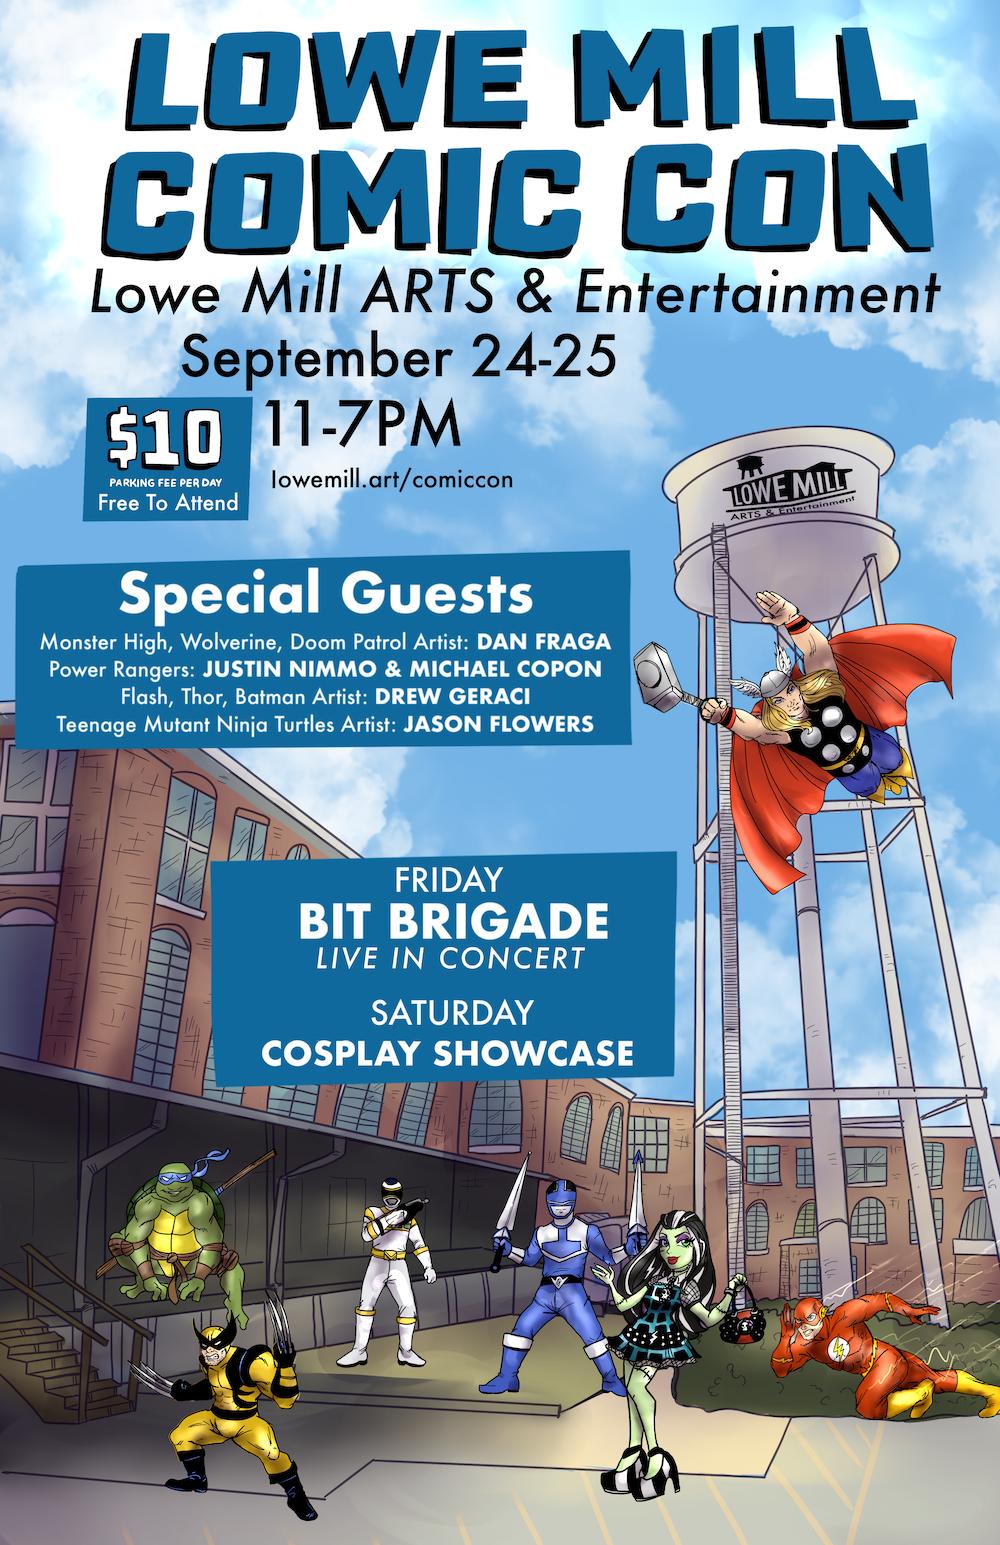 Lowe Mill Comic Con